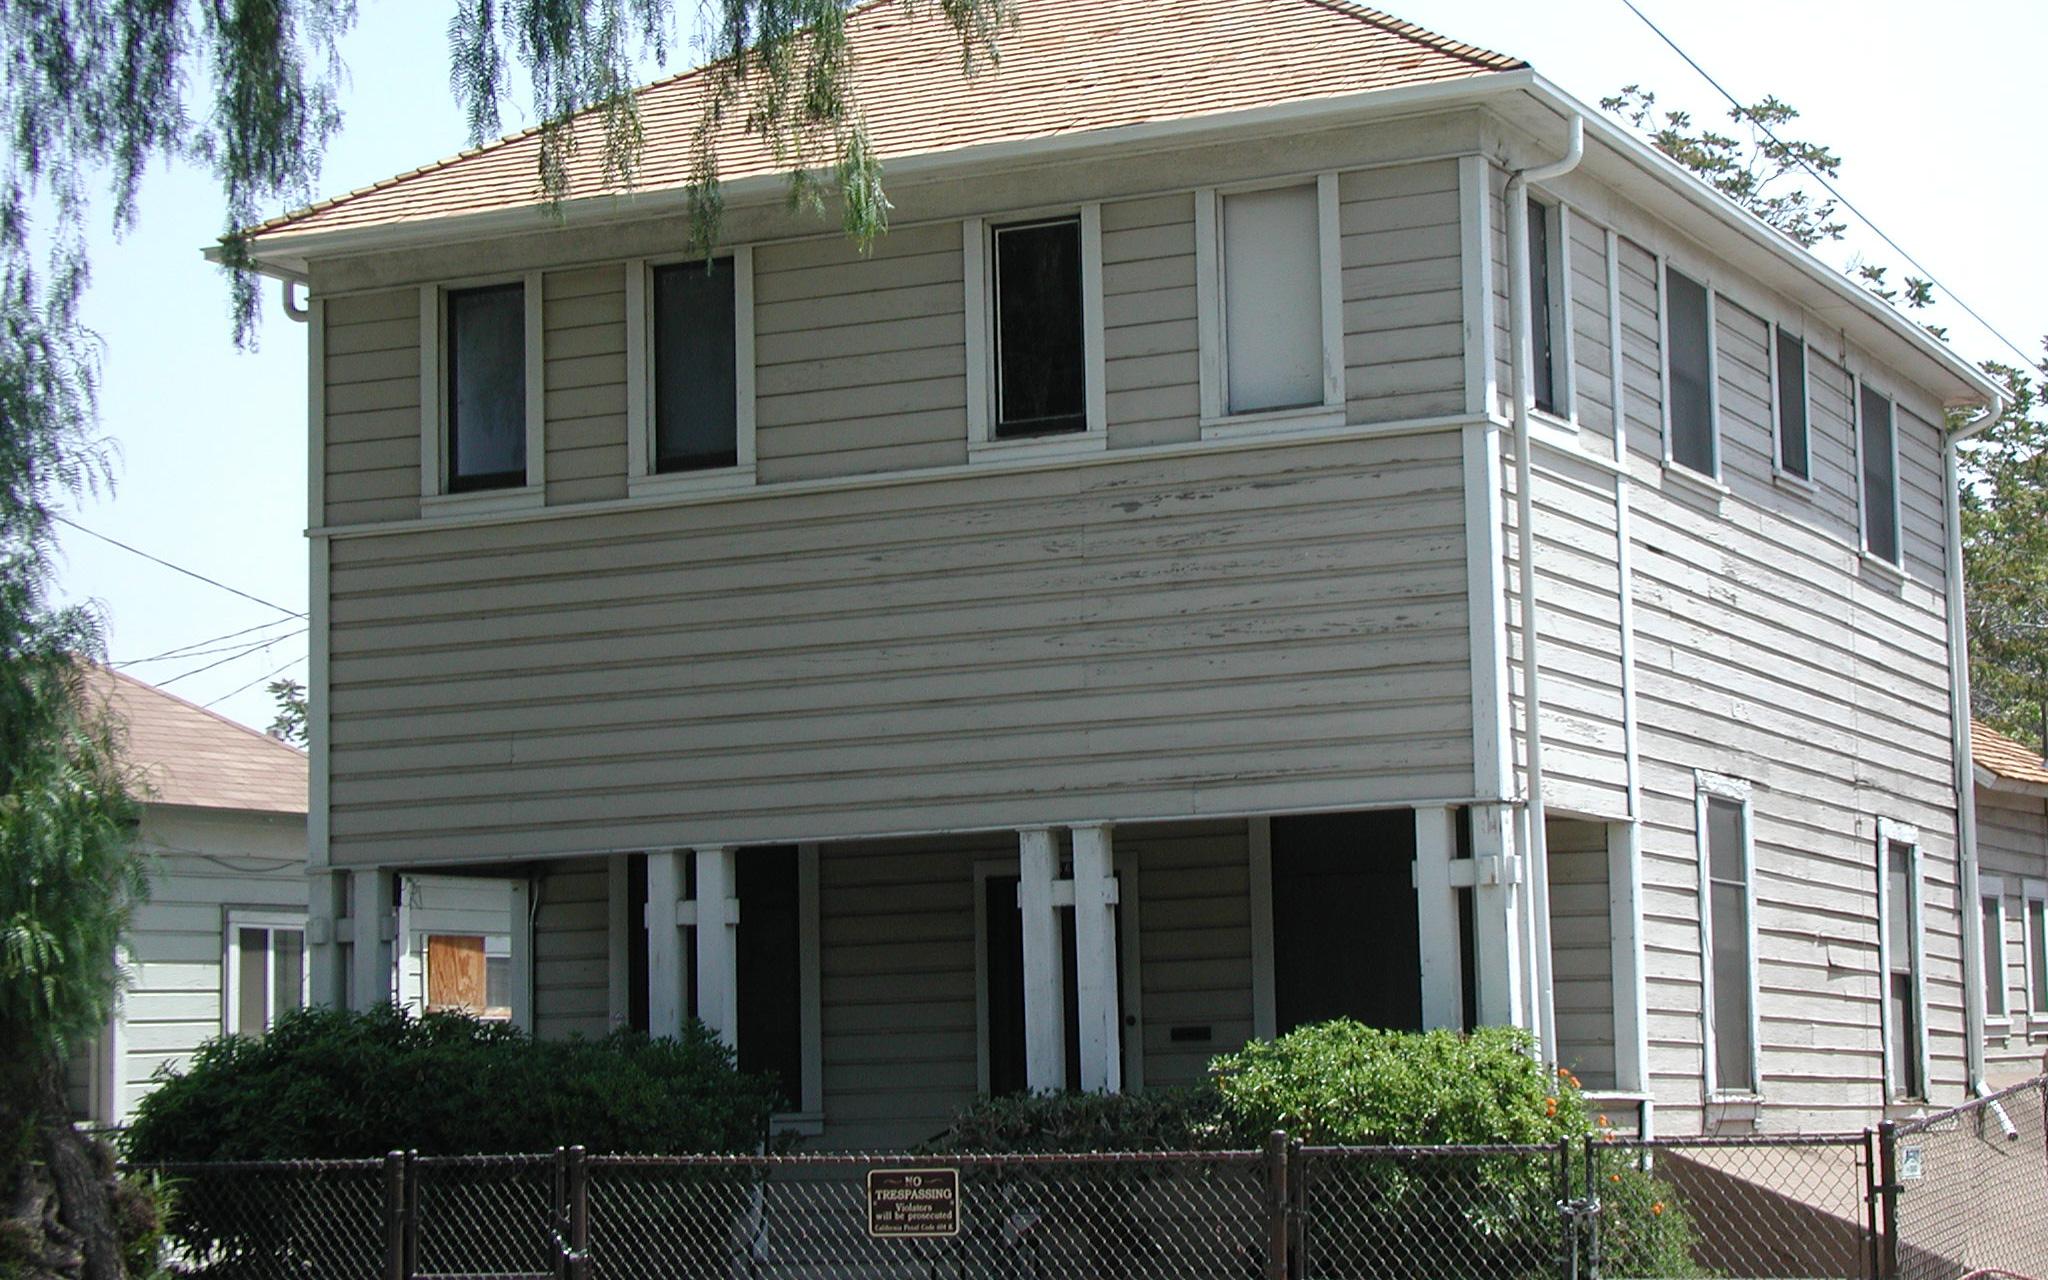 HARADA HOUSE